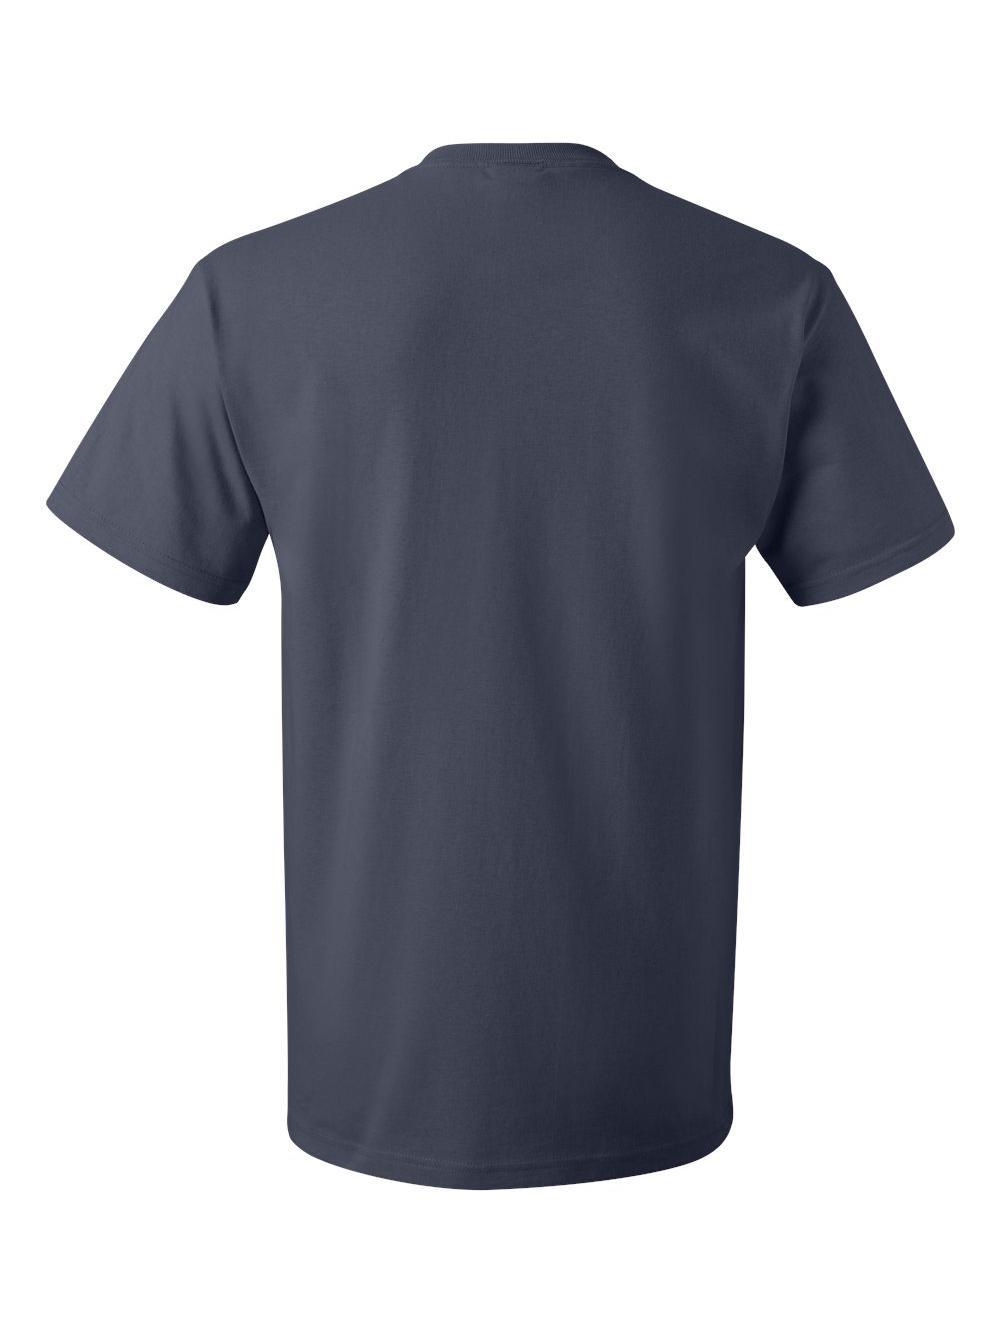 Fruit-of-the-Loom-HD-Cotton-Short-Sleeve-T-Shirt-3930R thumbnail 61